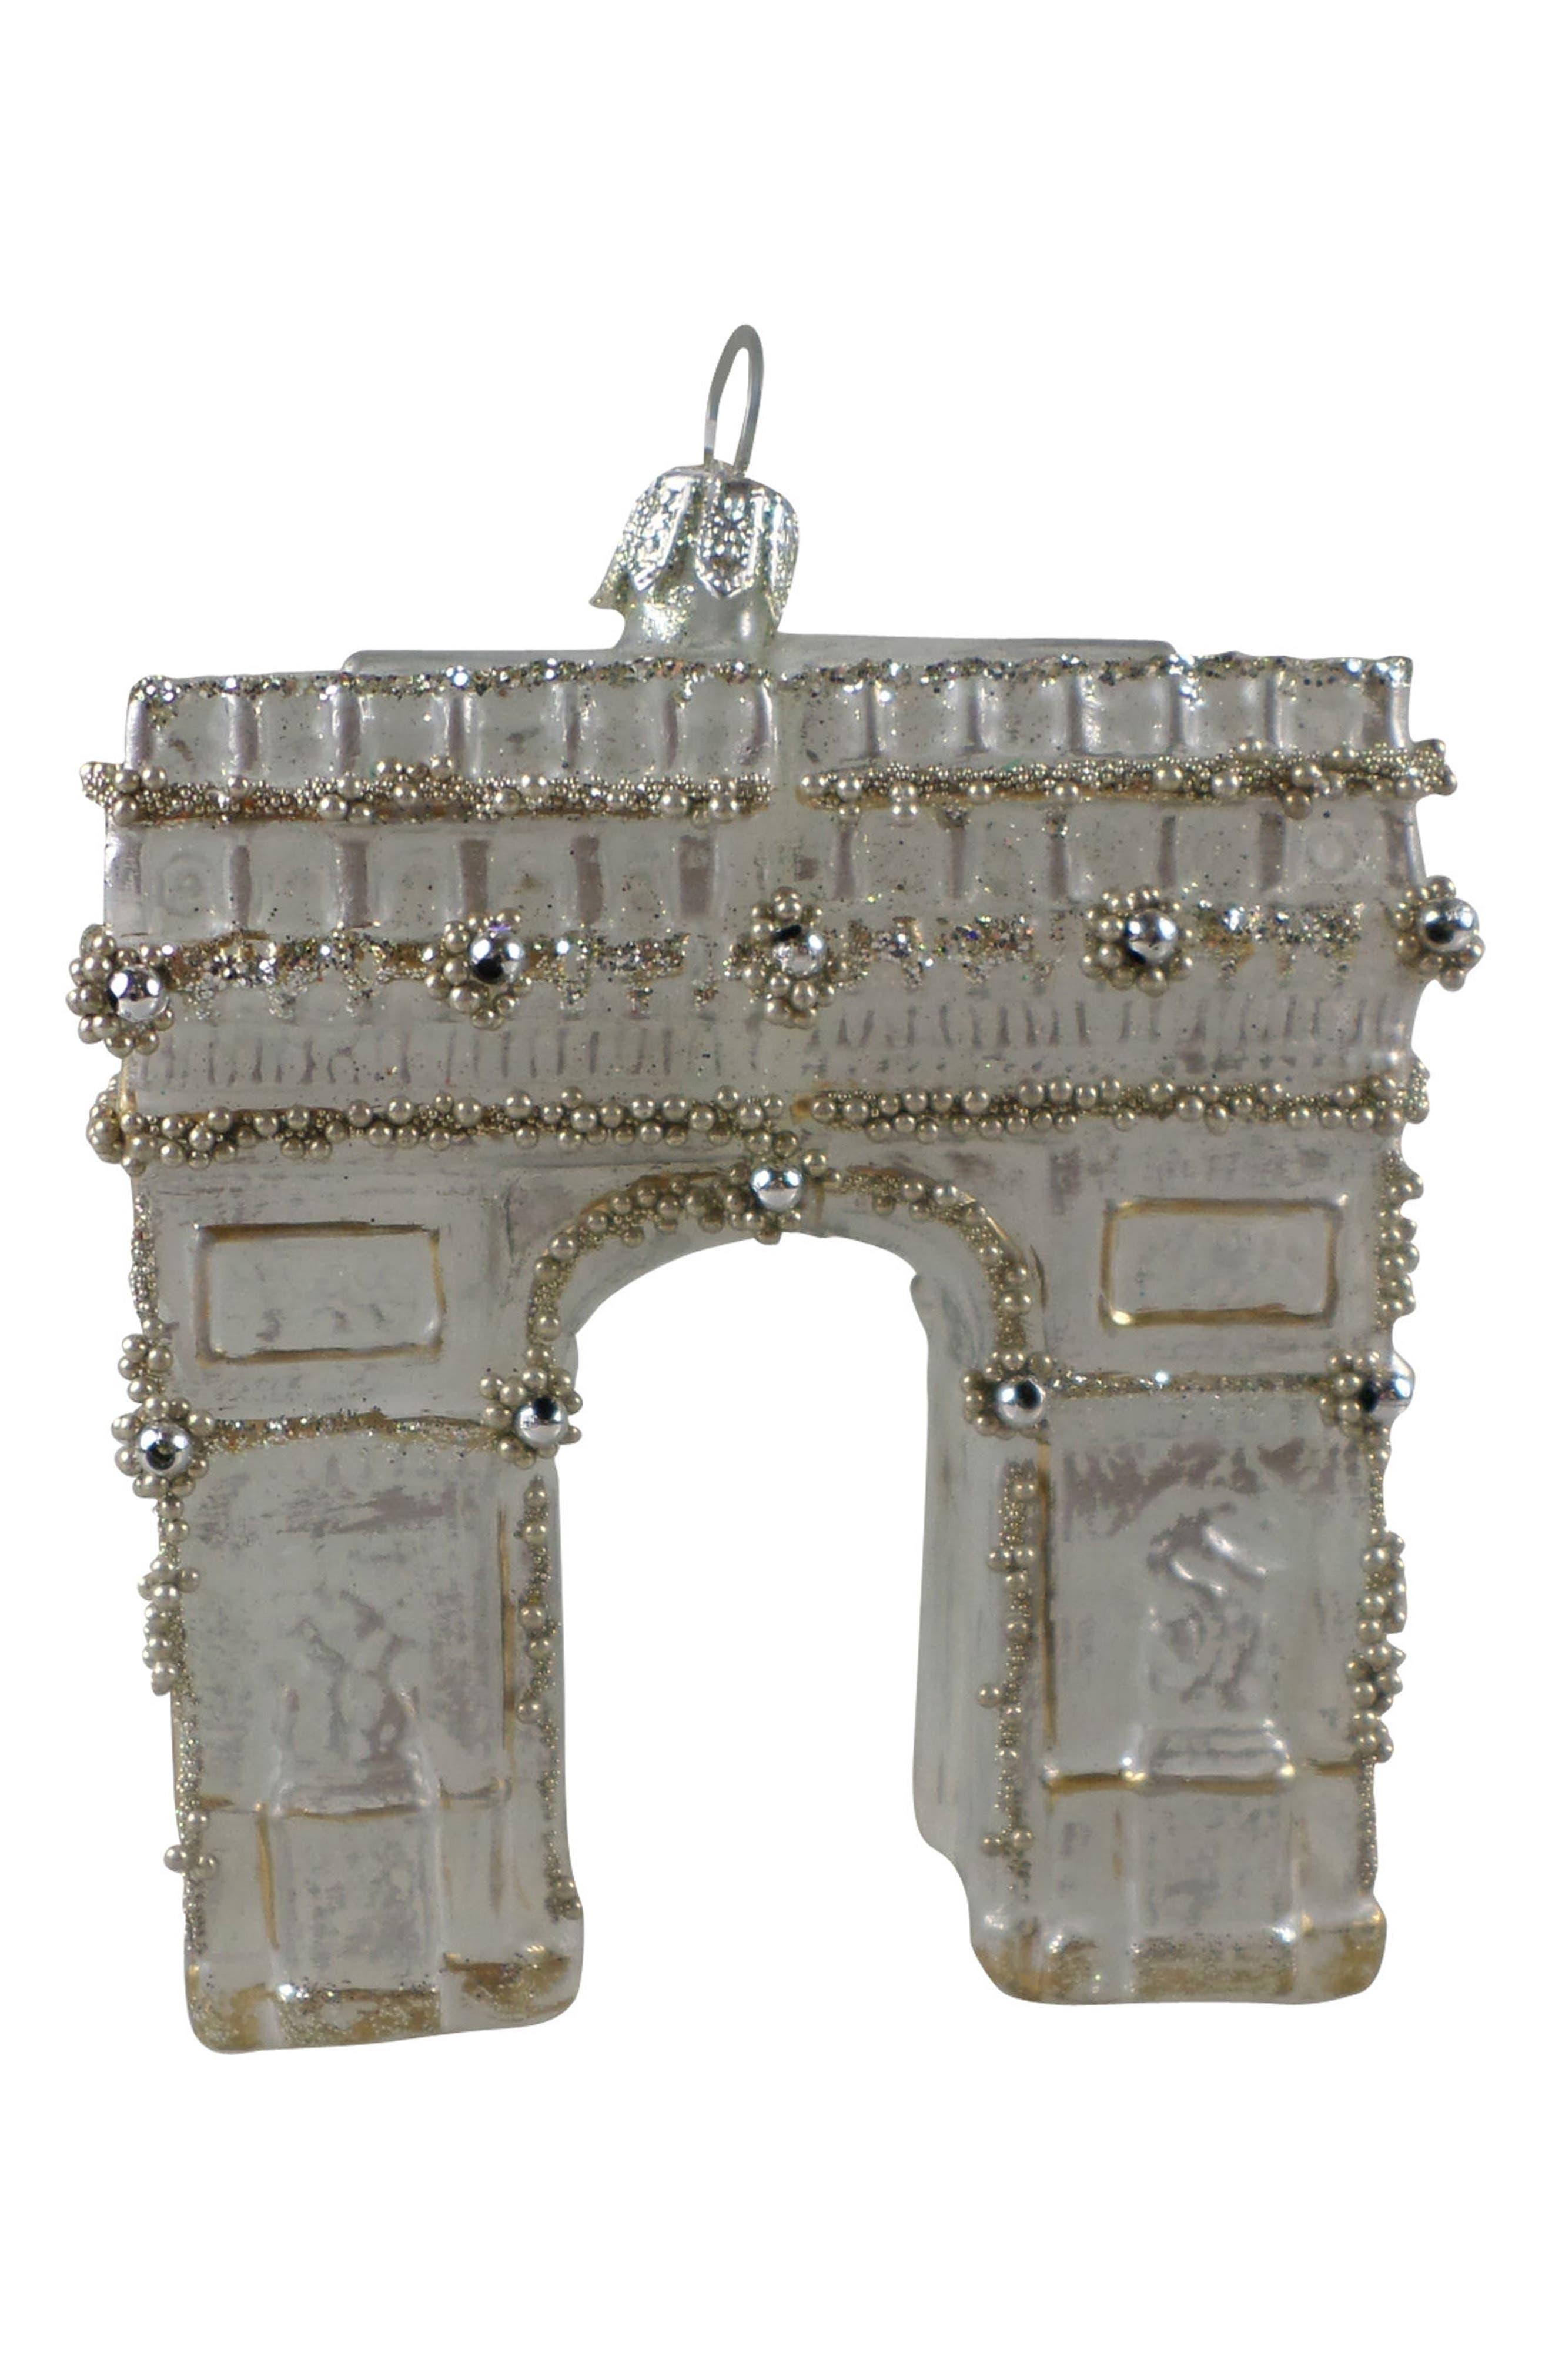 Nordstrom at Home Handblown Glass Arc de Triomphe Ornament